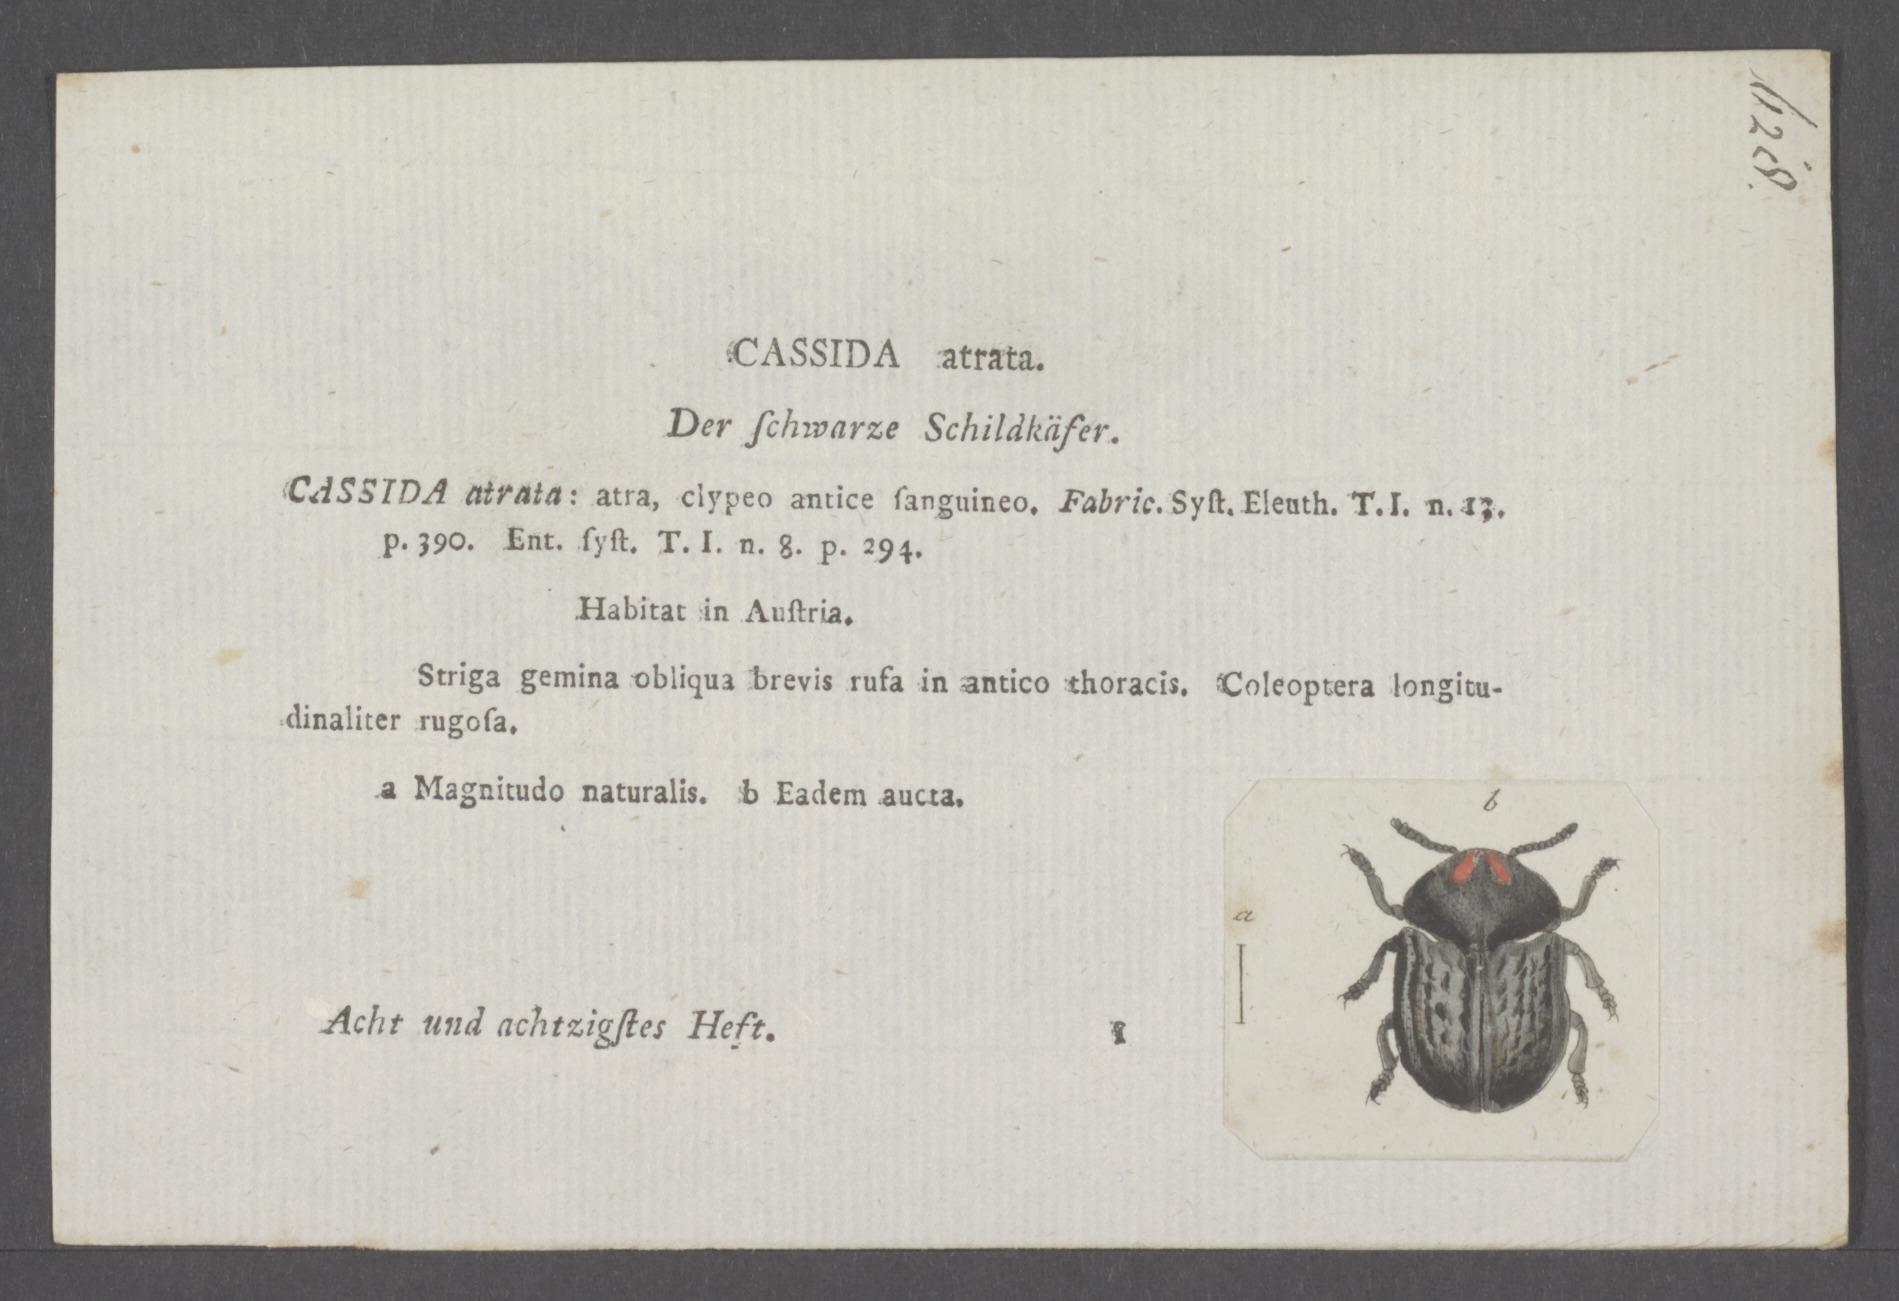 Image of Cassida